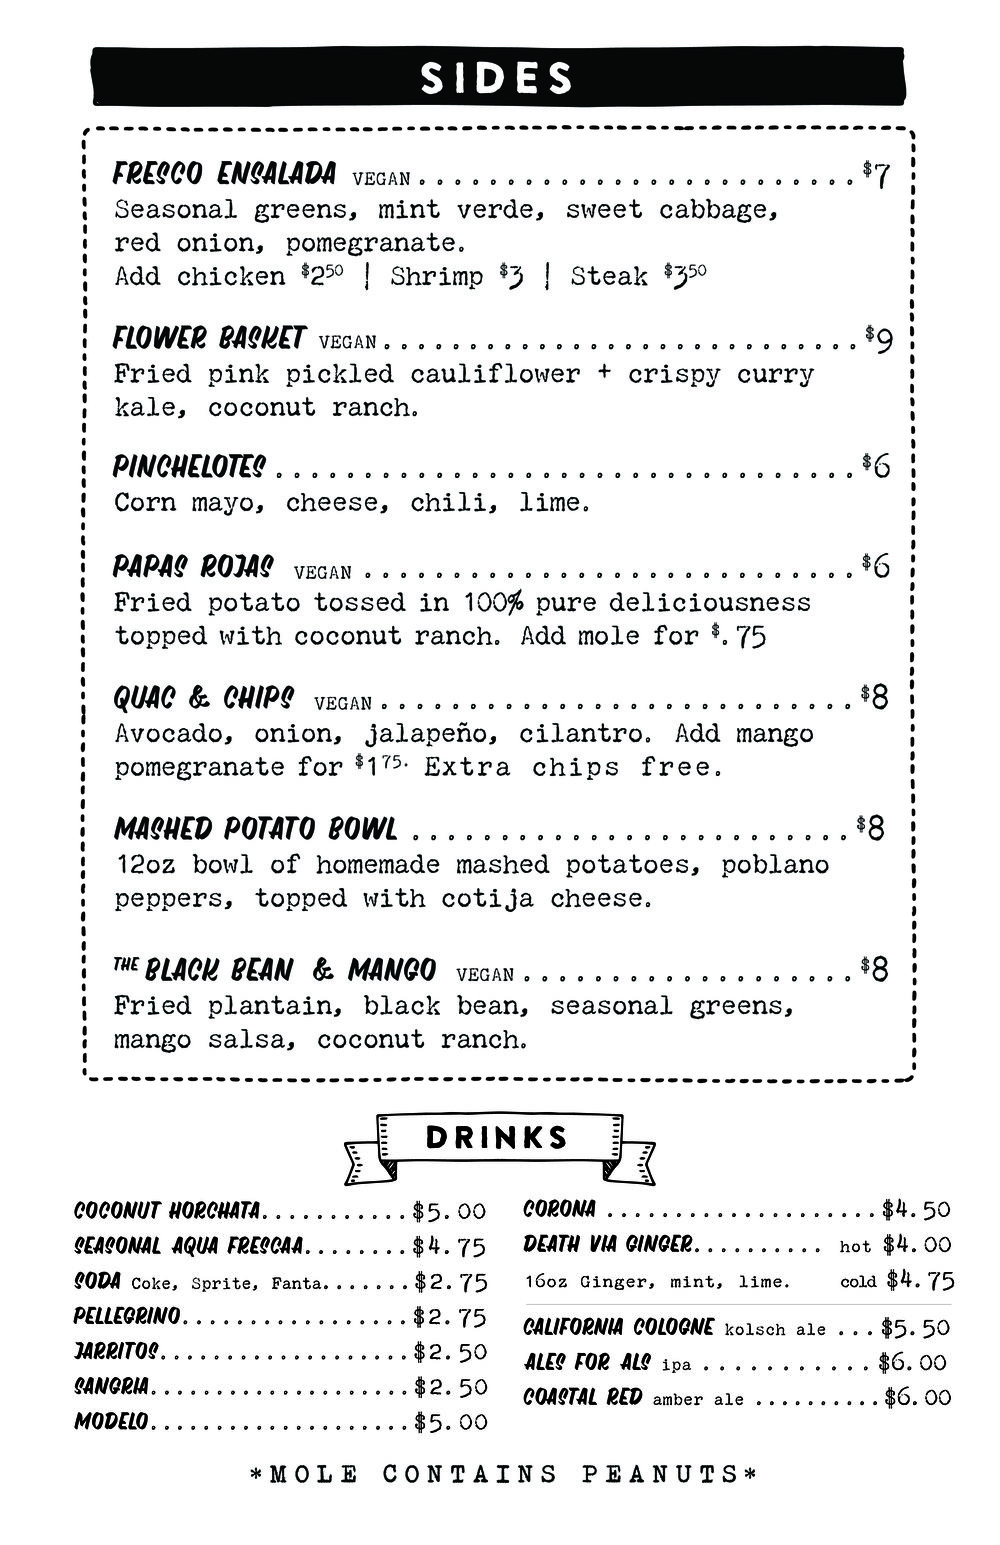 kake-chisme-cantina-best-restaurant-menu-design-chicago-02.jpg